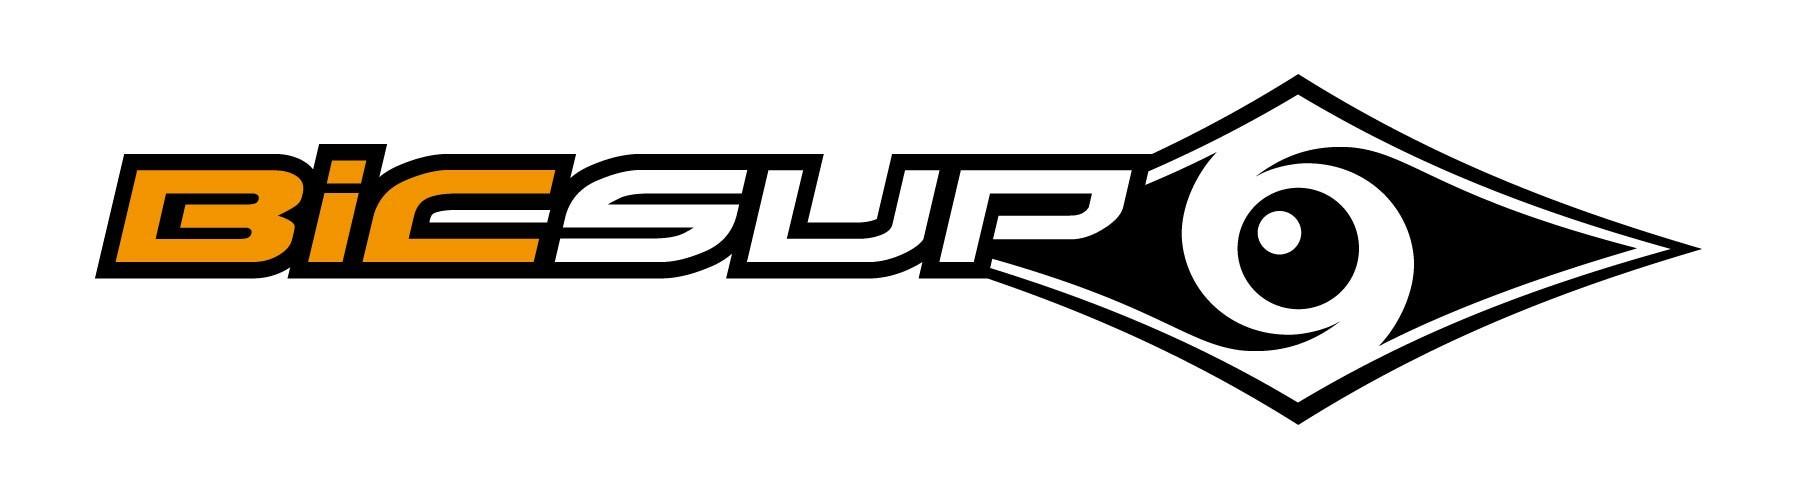 bic-sup-logodiamond-long-hr.jpg